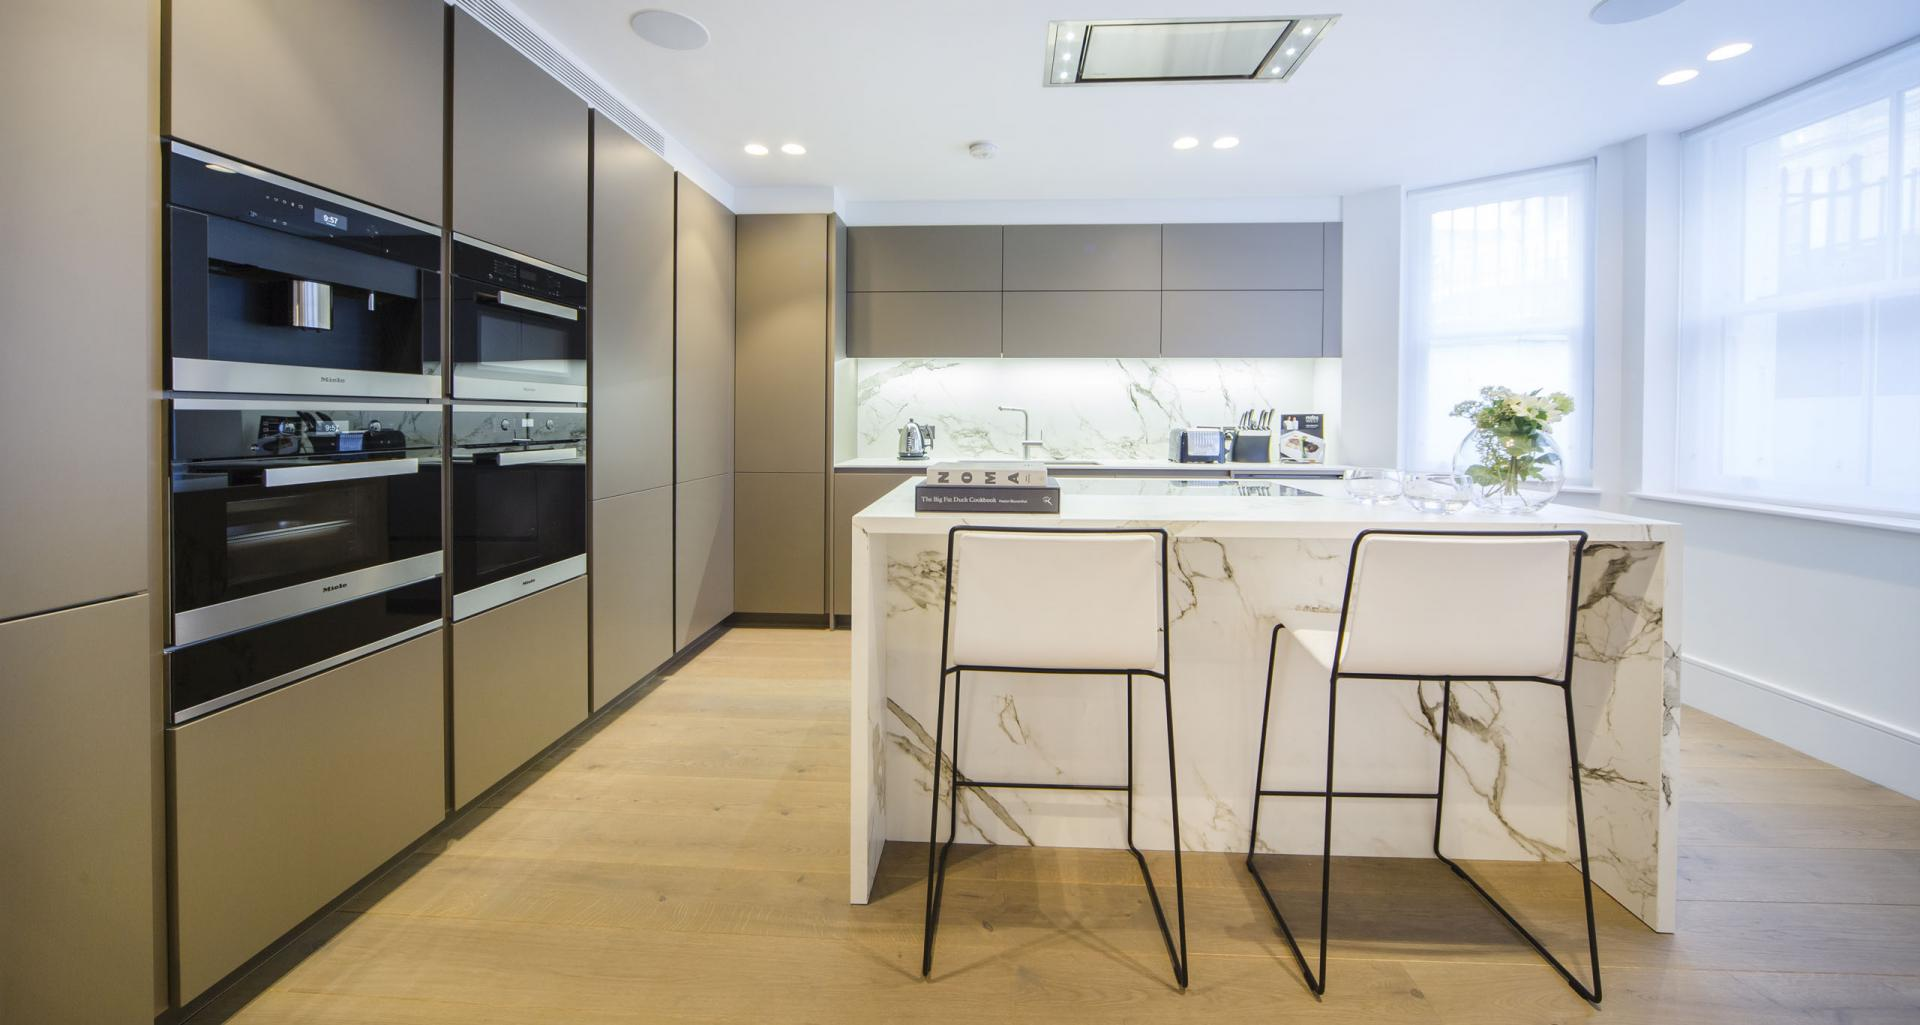 Kitchen at 21 Campden Hill Garden House, Notting Hill, London - Citybase Apartments